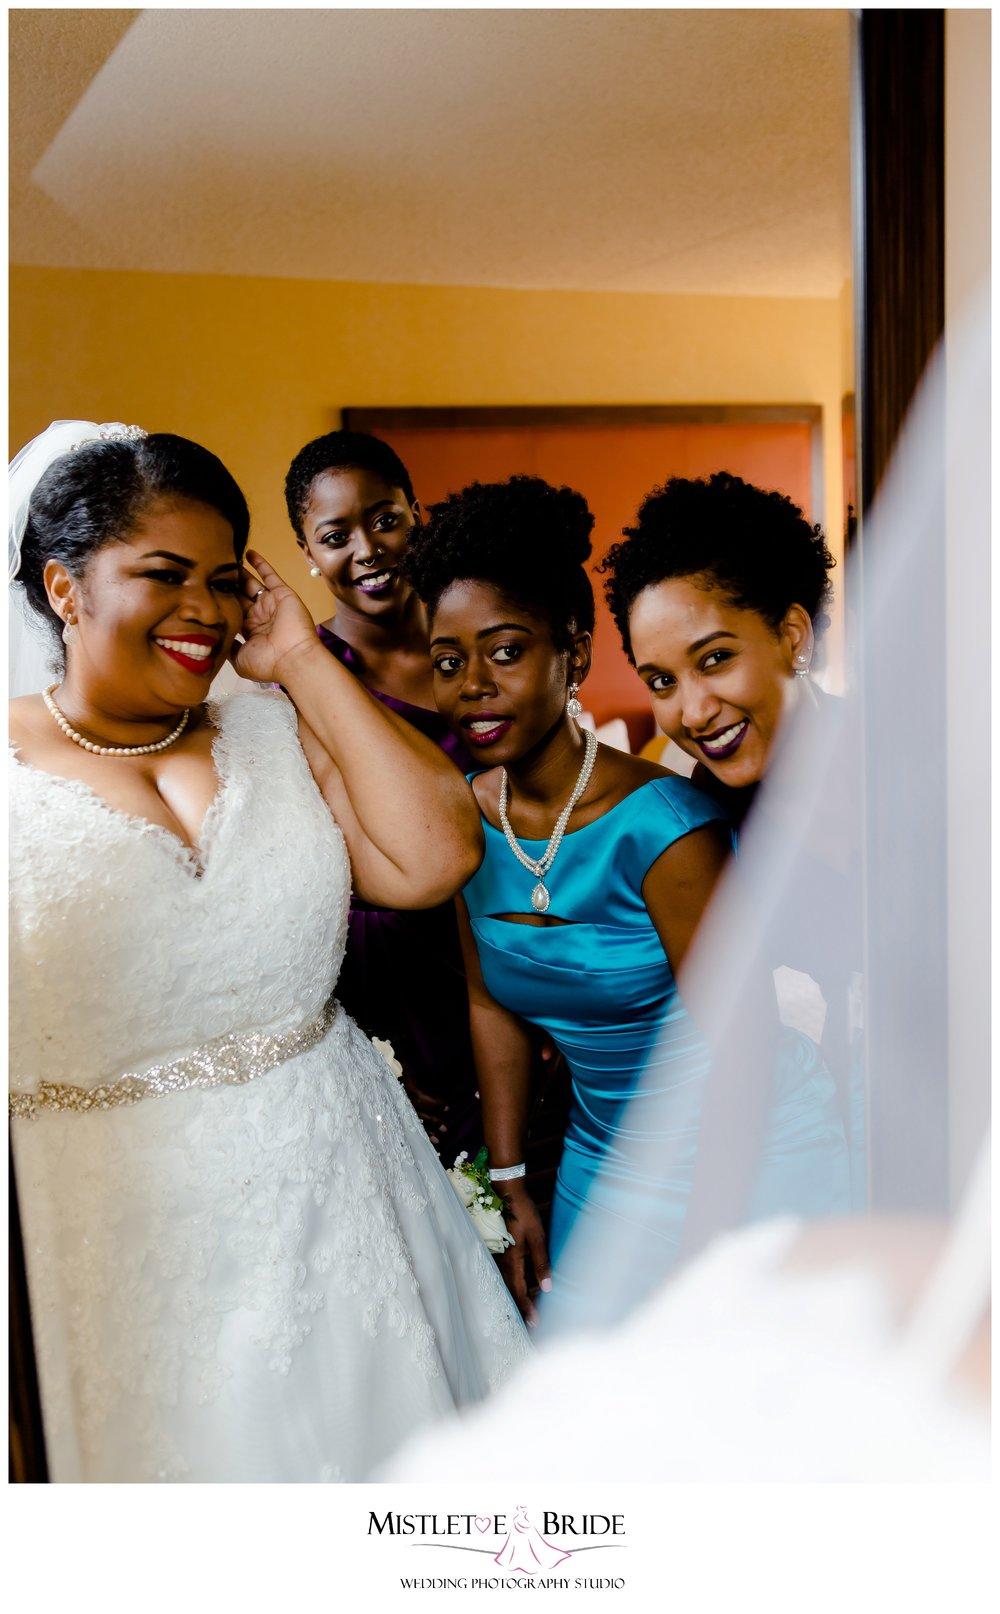 nj-wedding-fairfield-nj-19-52.JPG